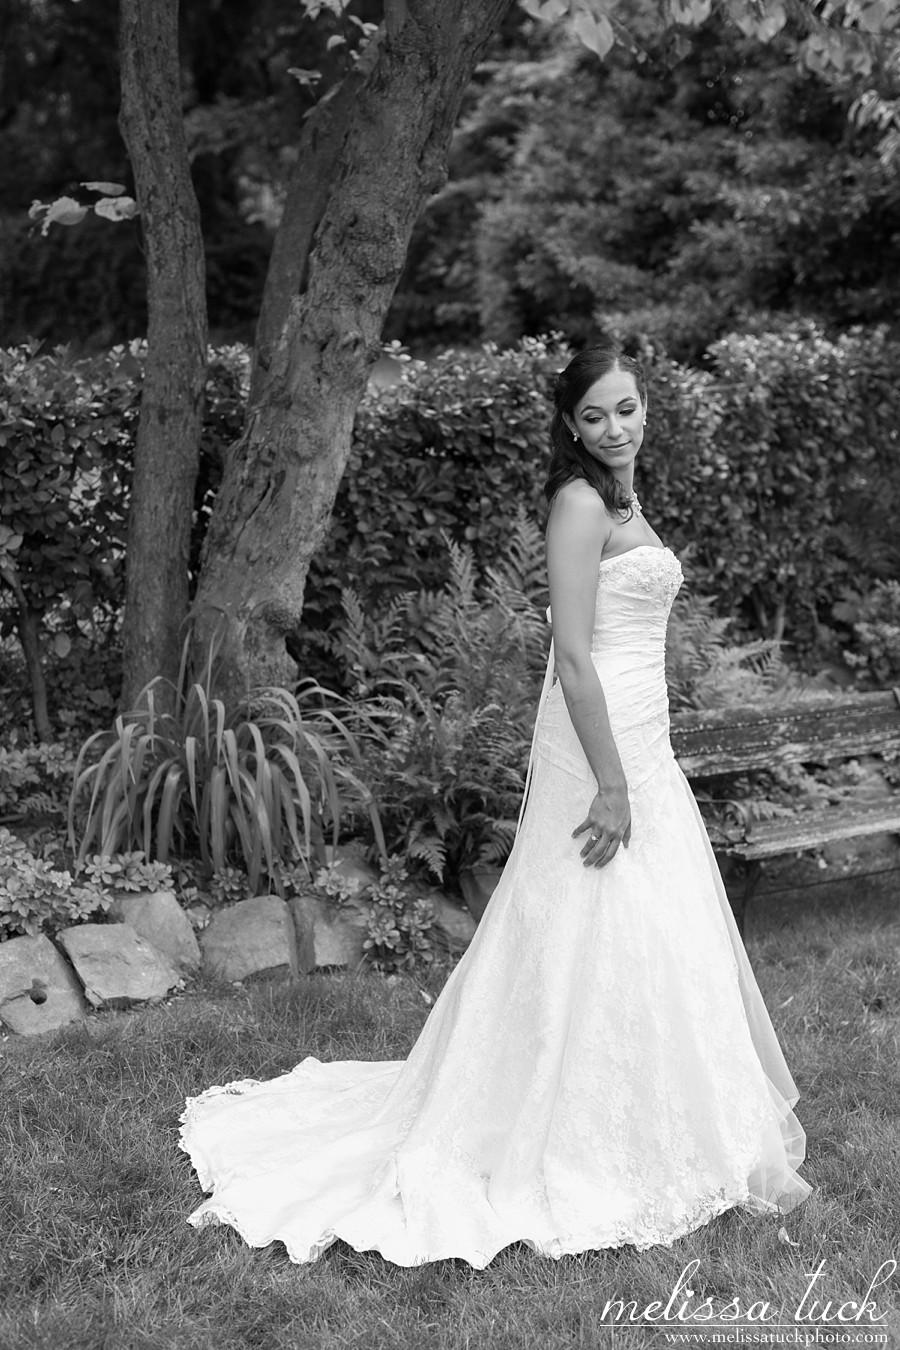 Maryland-wedding-photographer-CC_0005.jpg